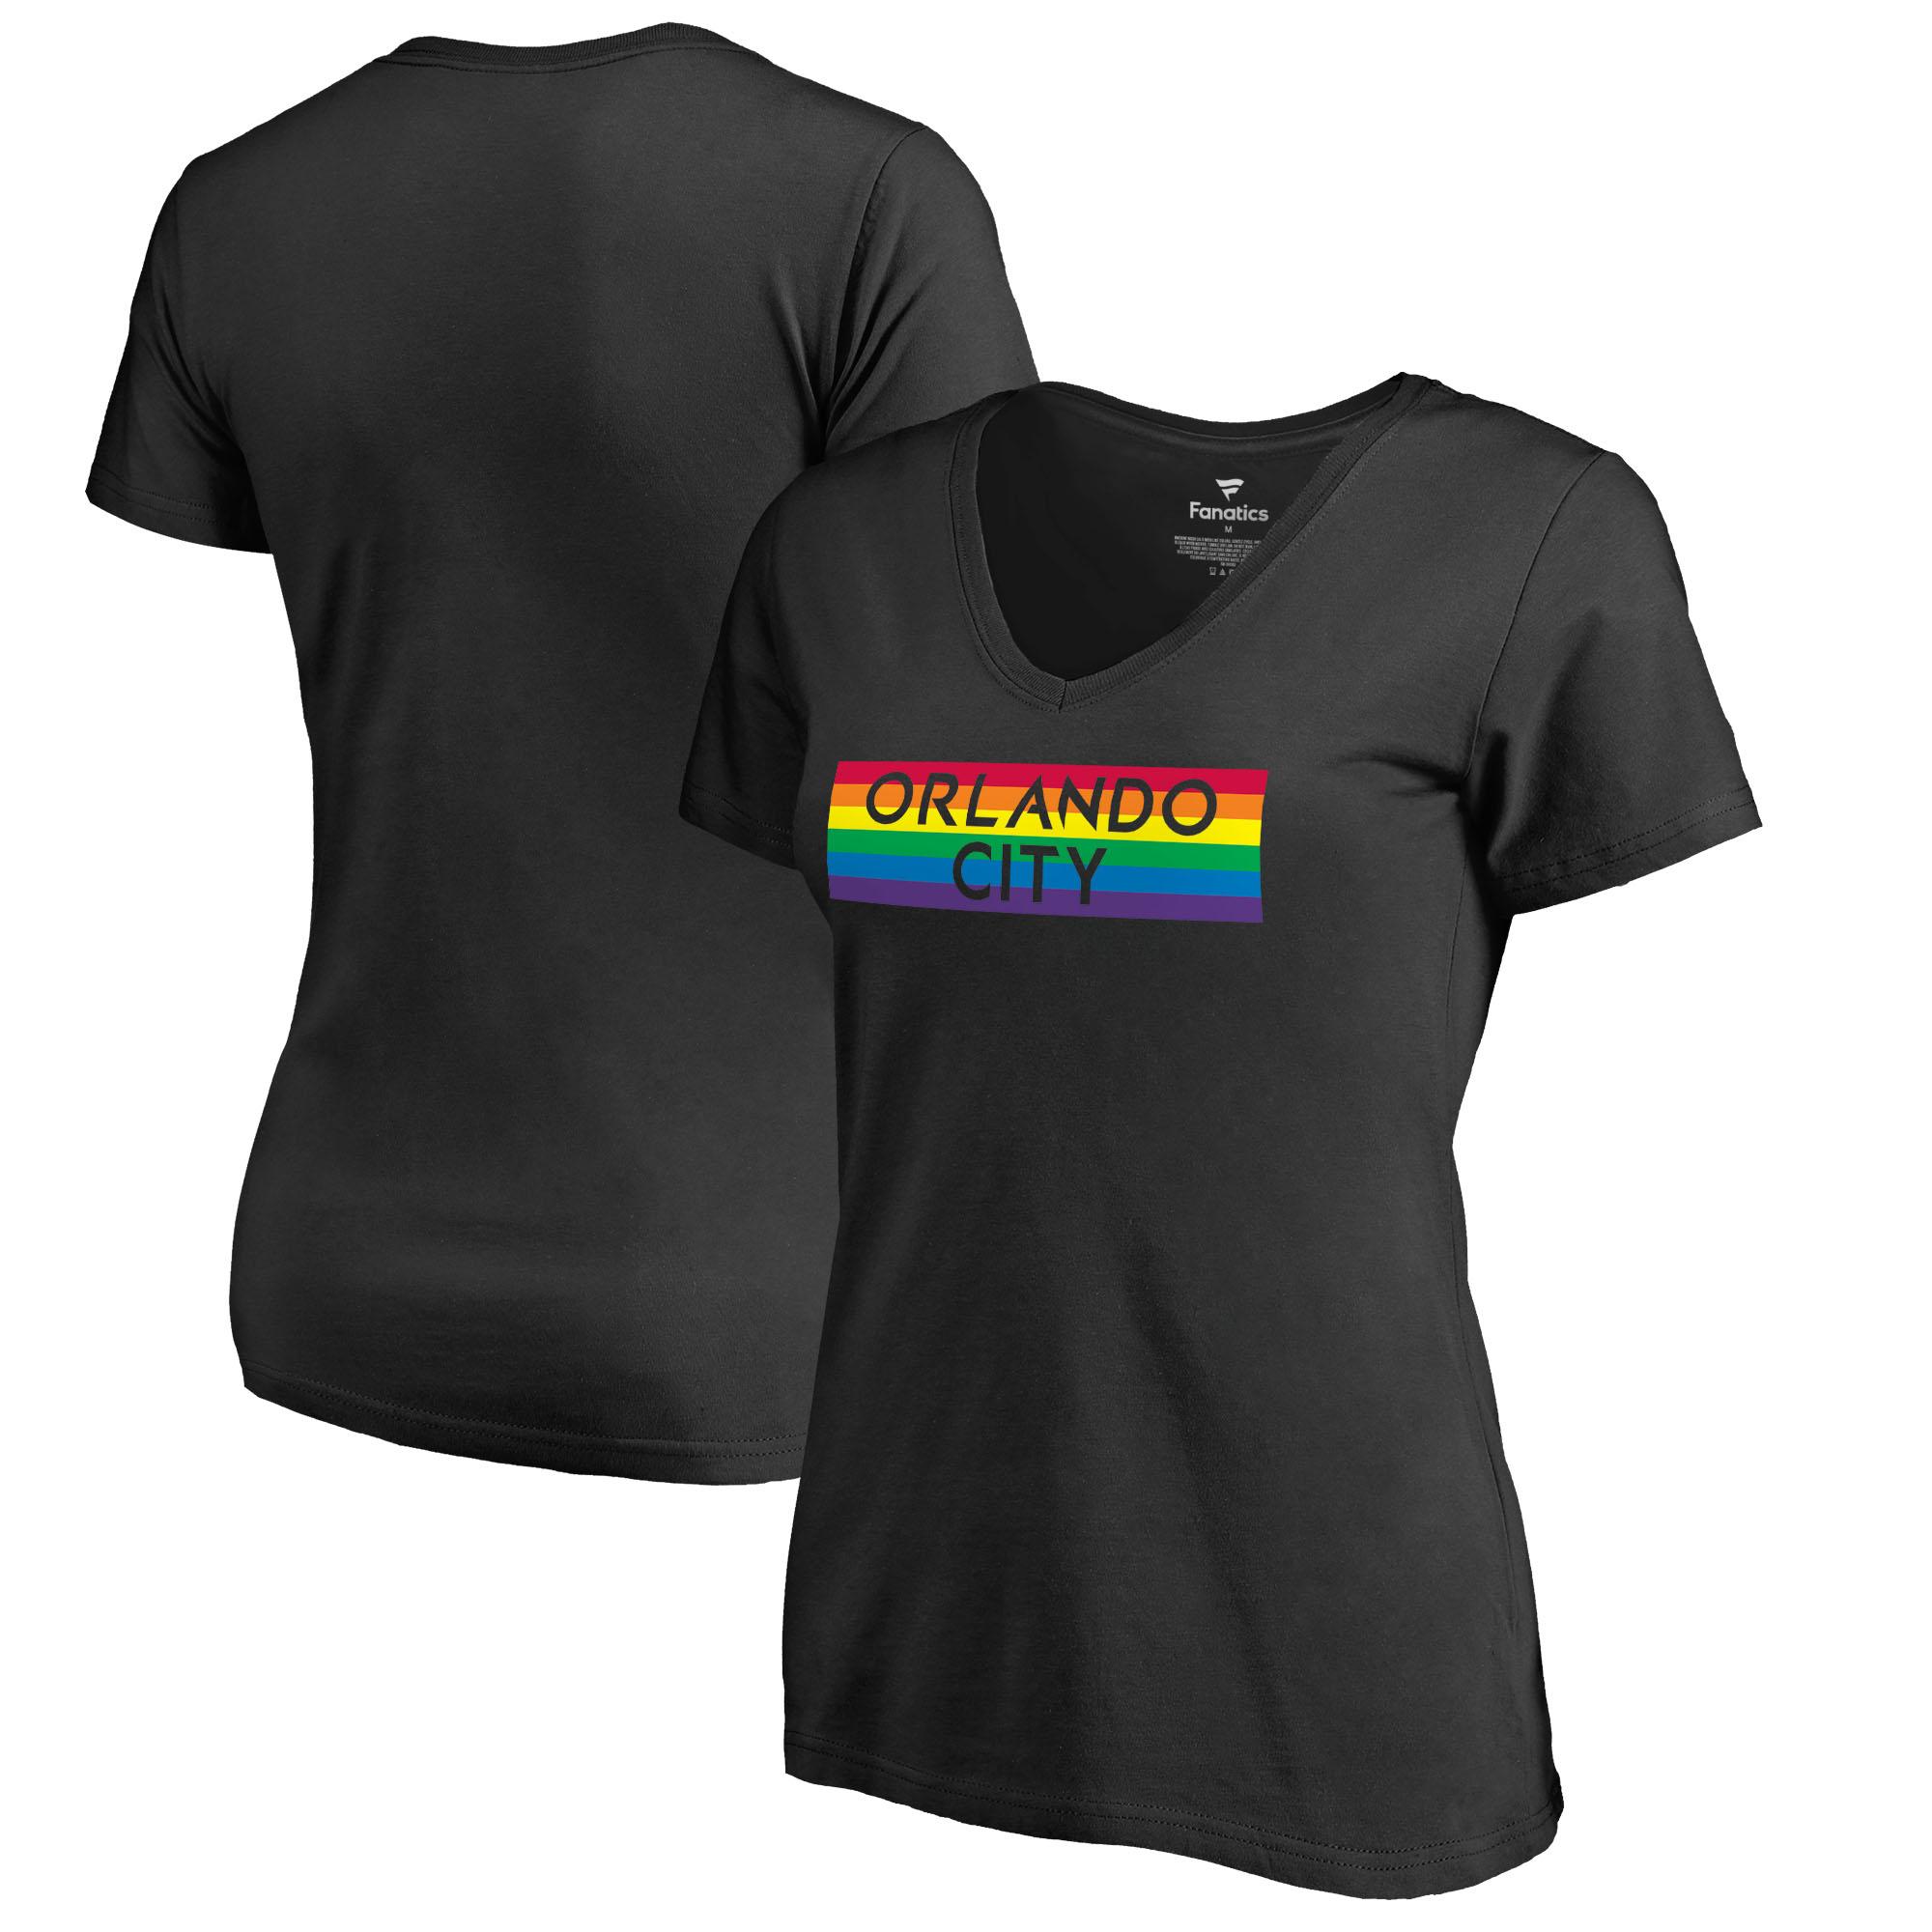 Orlando City SC Fanatics Branded Women's Pride Wordmark V-Neck T-Shirt - Black